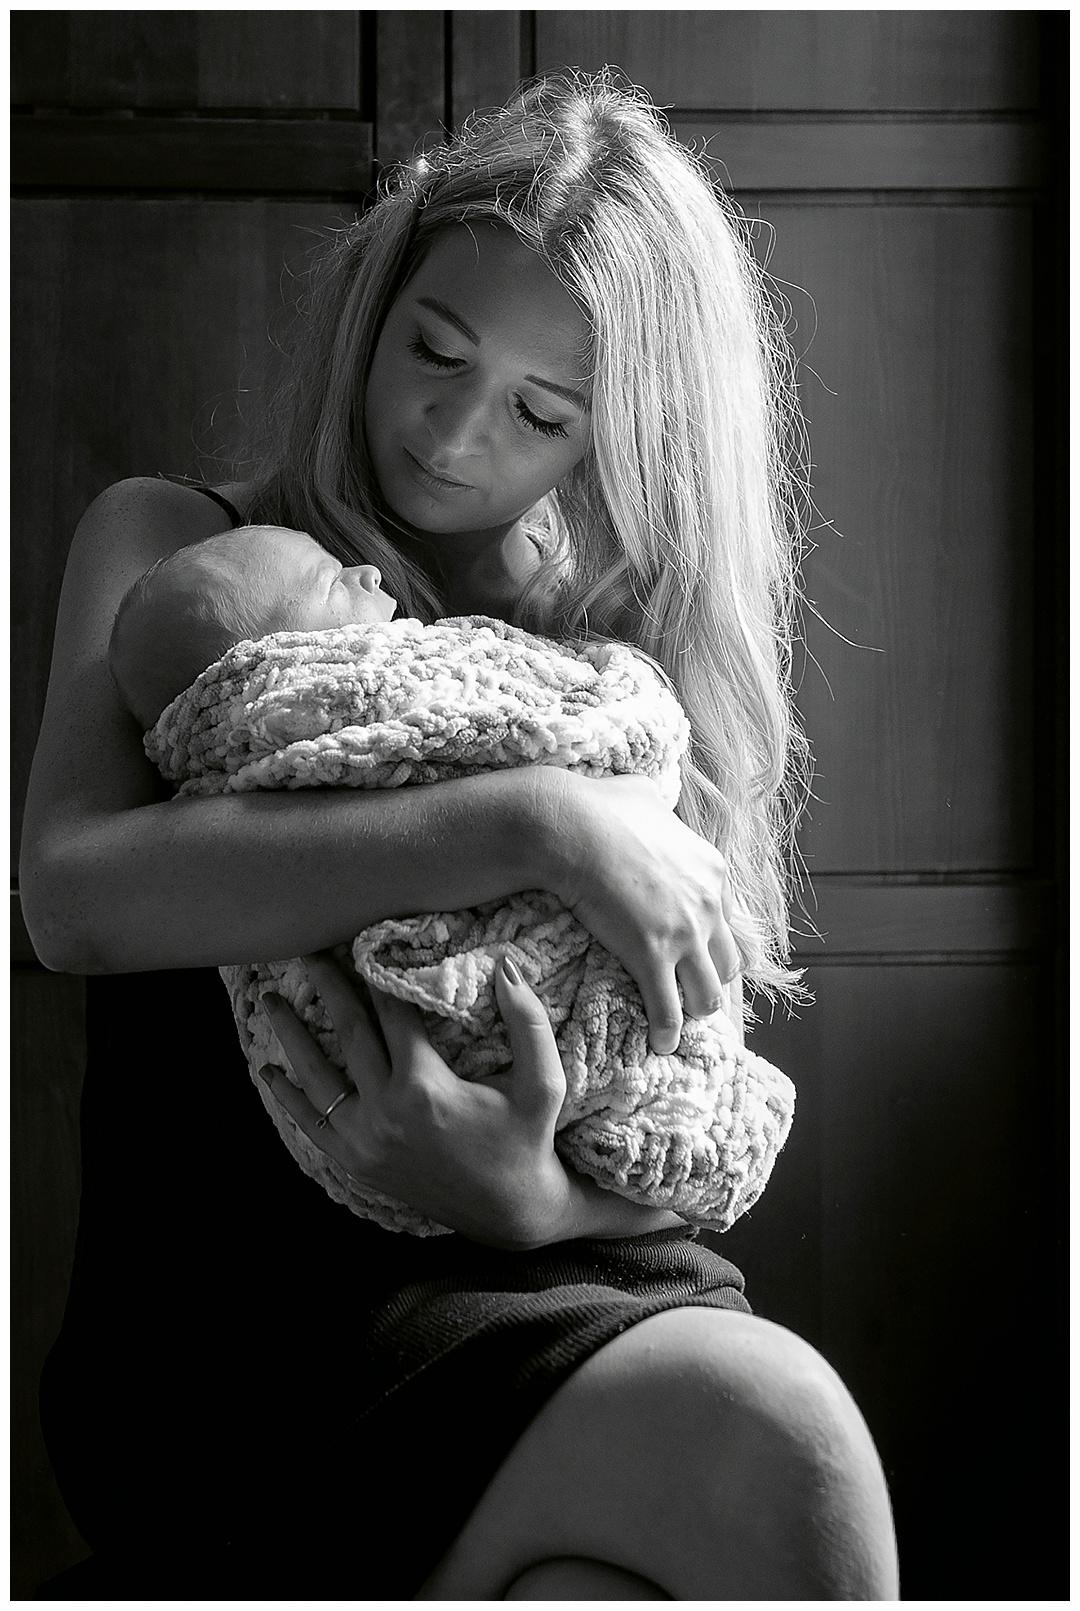 Sarah_Bee_Photography New_born_photography_family_portraits_new_born_photographer_natural_photography Cheadle_Stockport_Ashton-under_lyne_1352.jpg